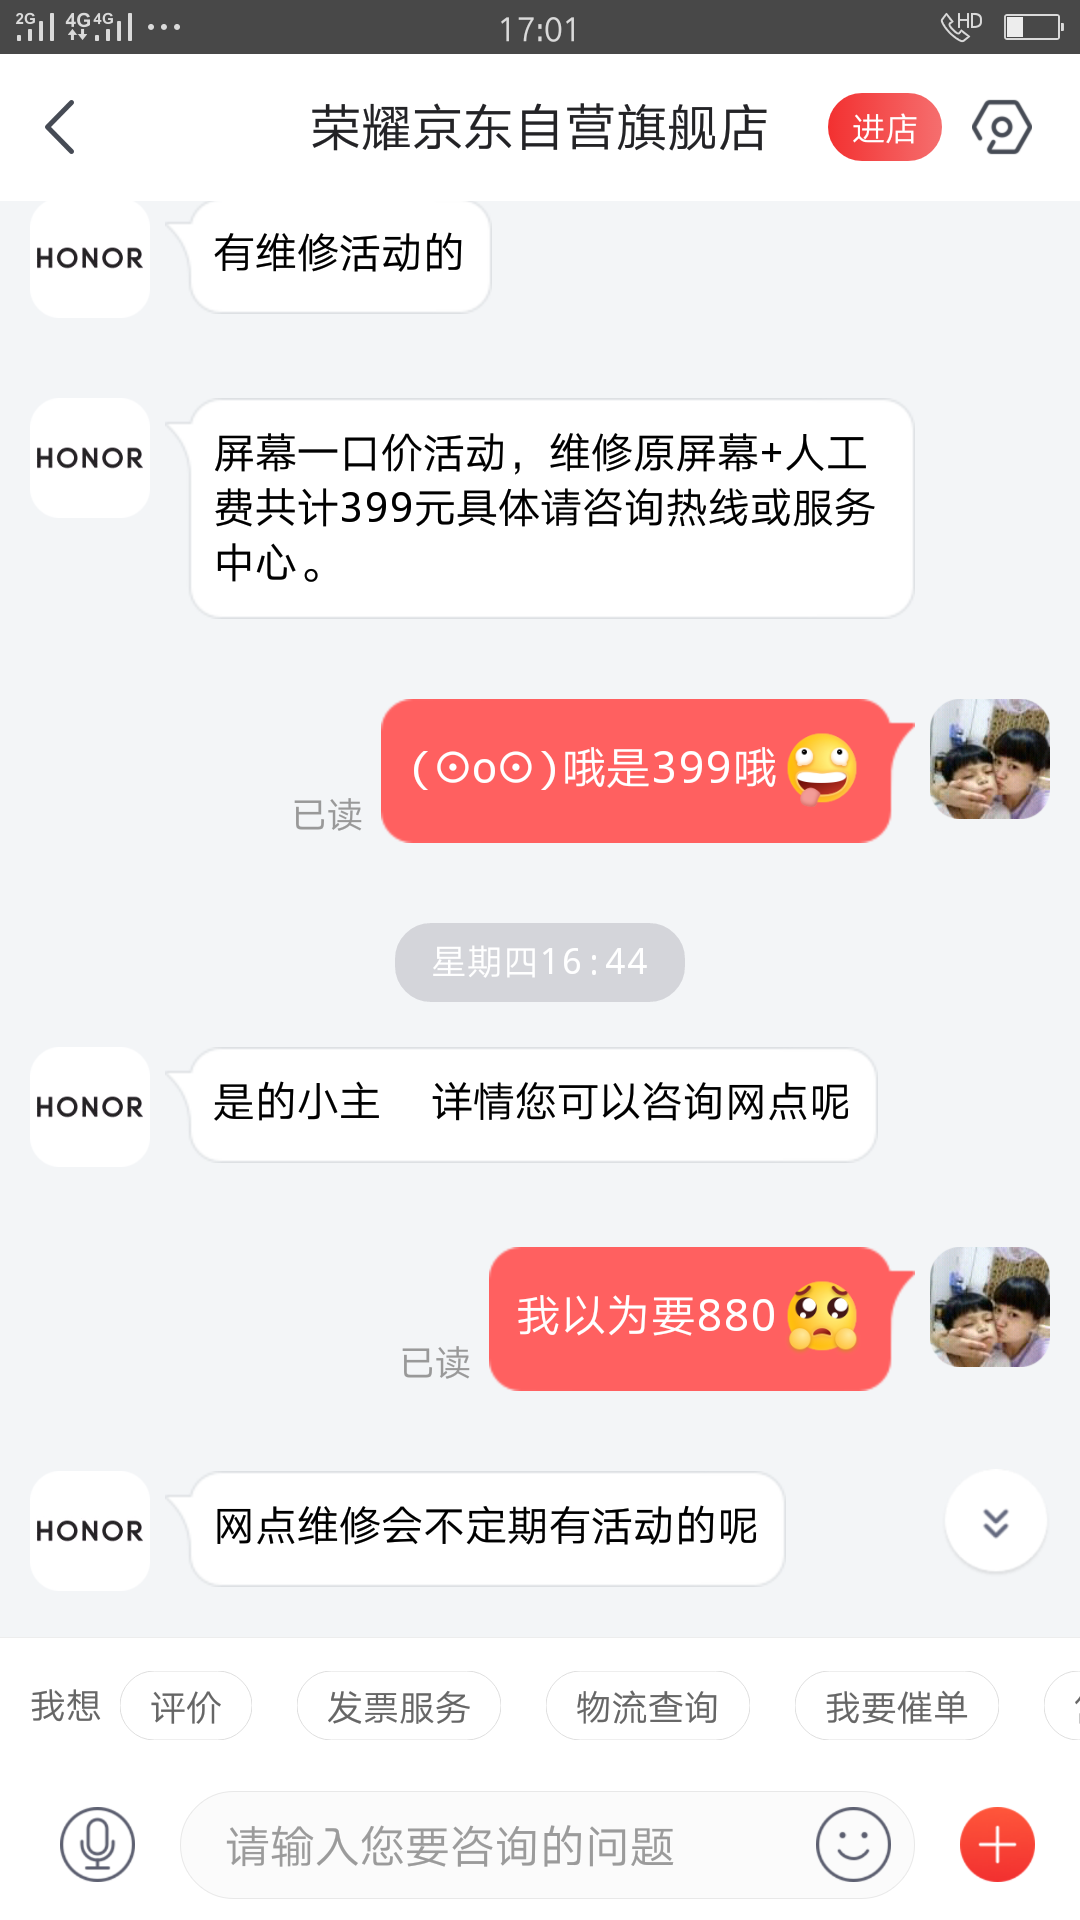 Screenshot_2019-08-24-17-01-35-66.png